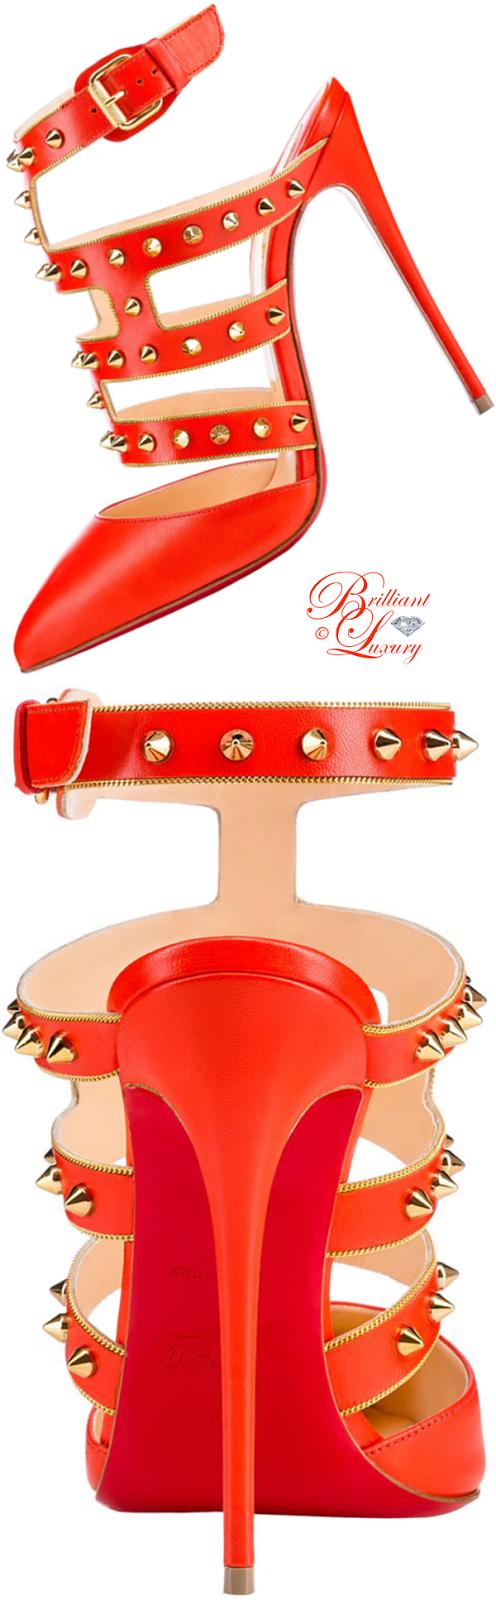 Brilliant Luxury ♦ Christian Louboutin Tchicaboum Kid pump